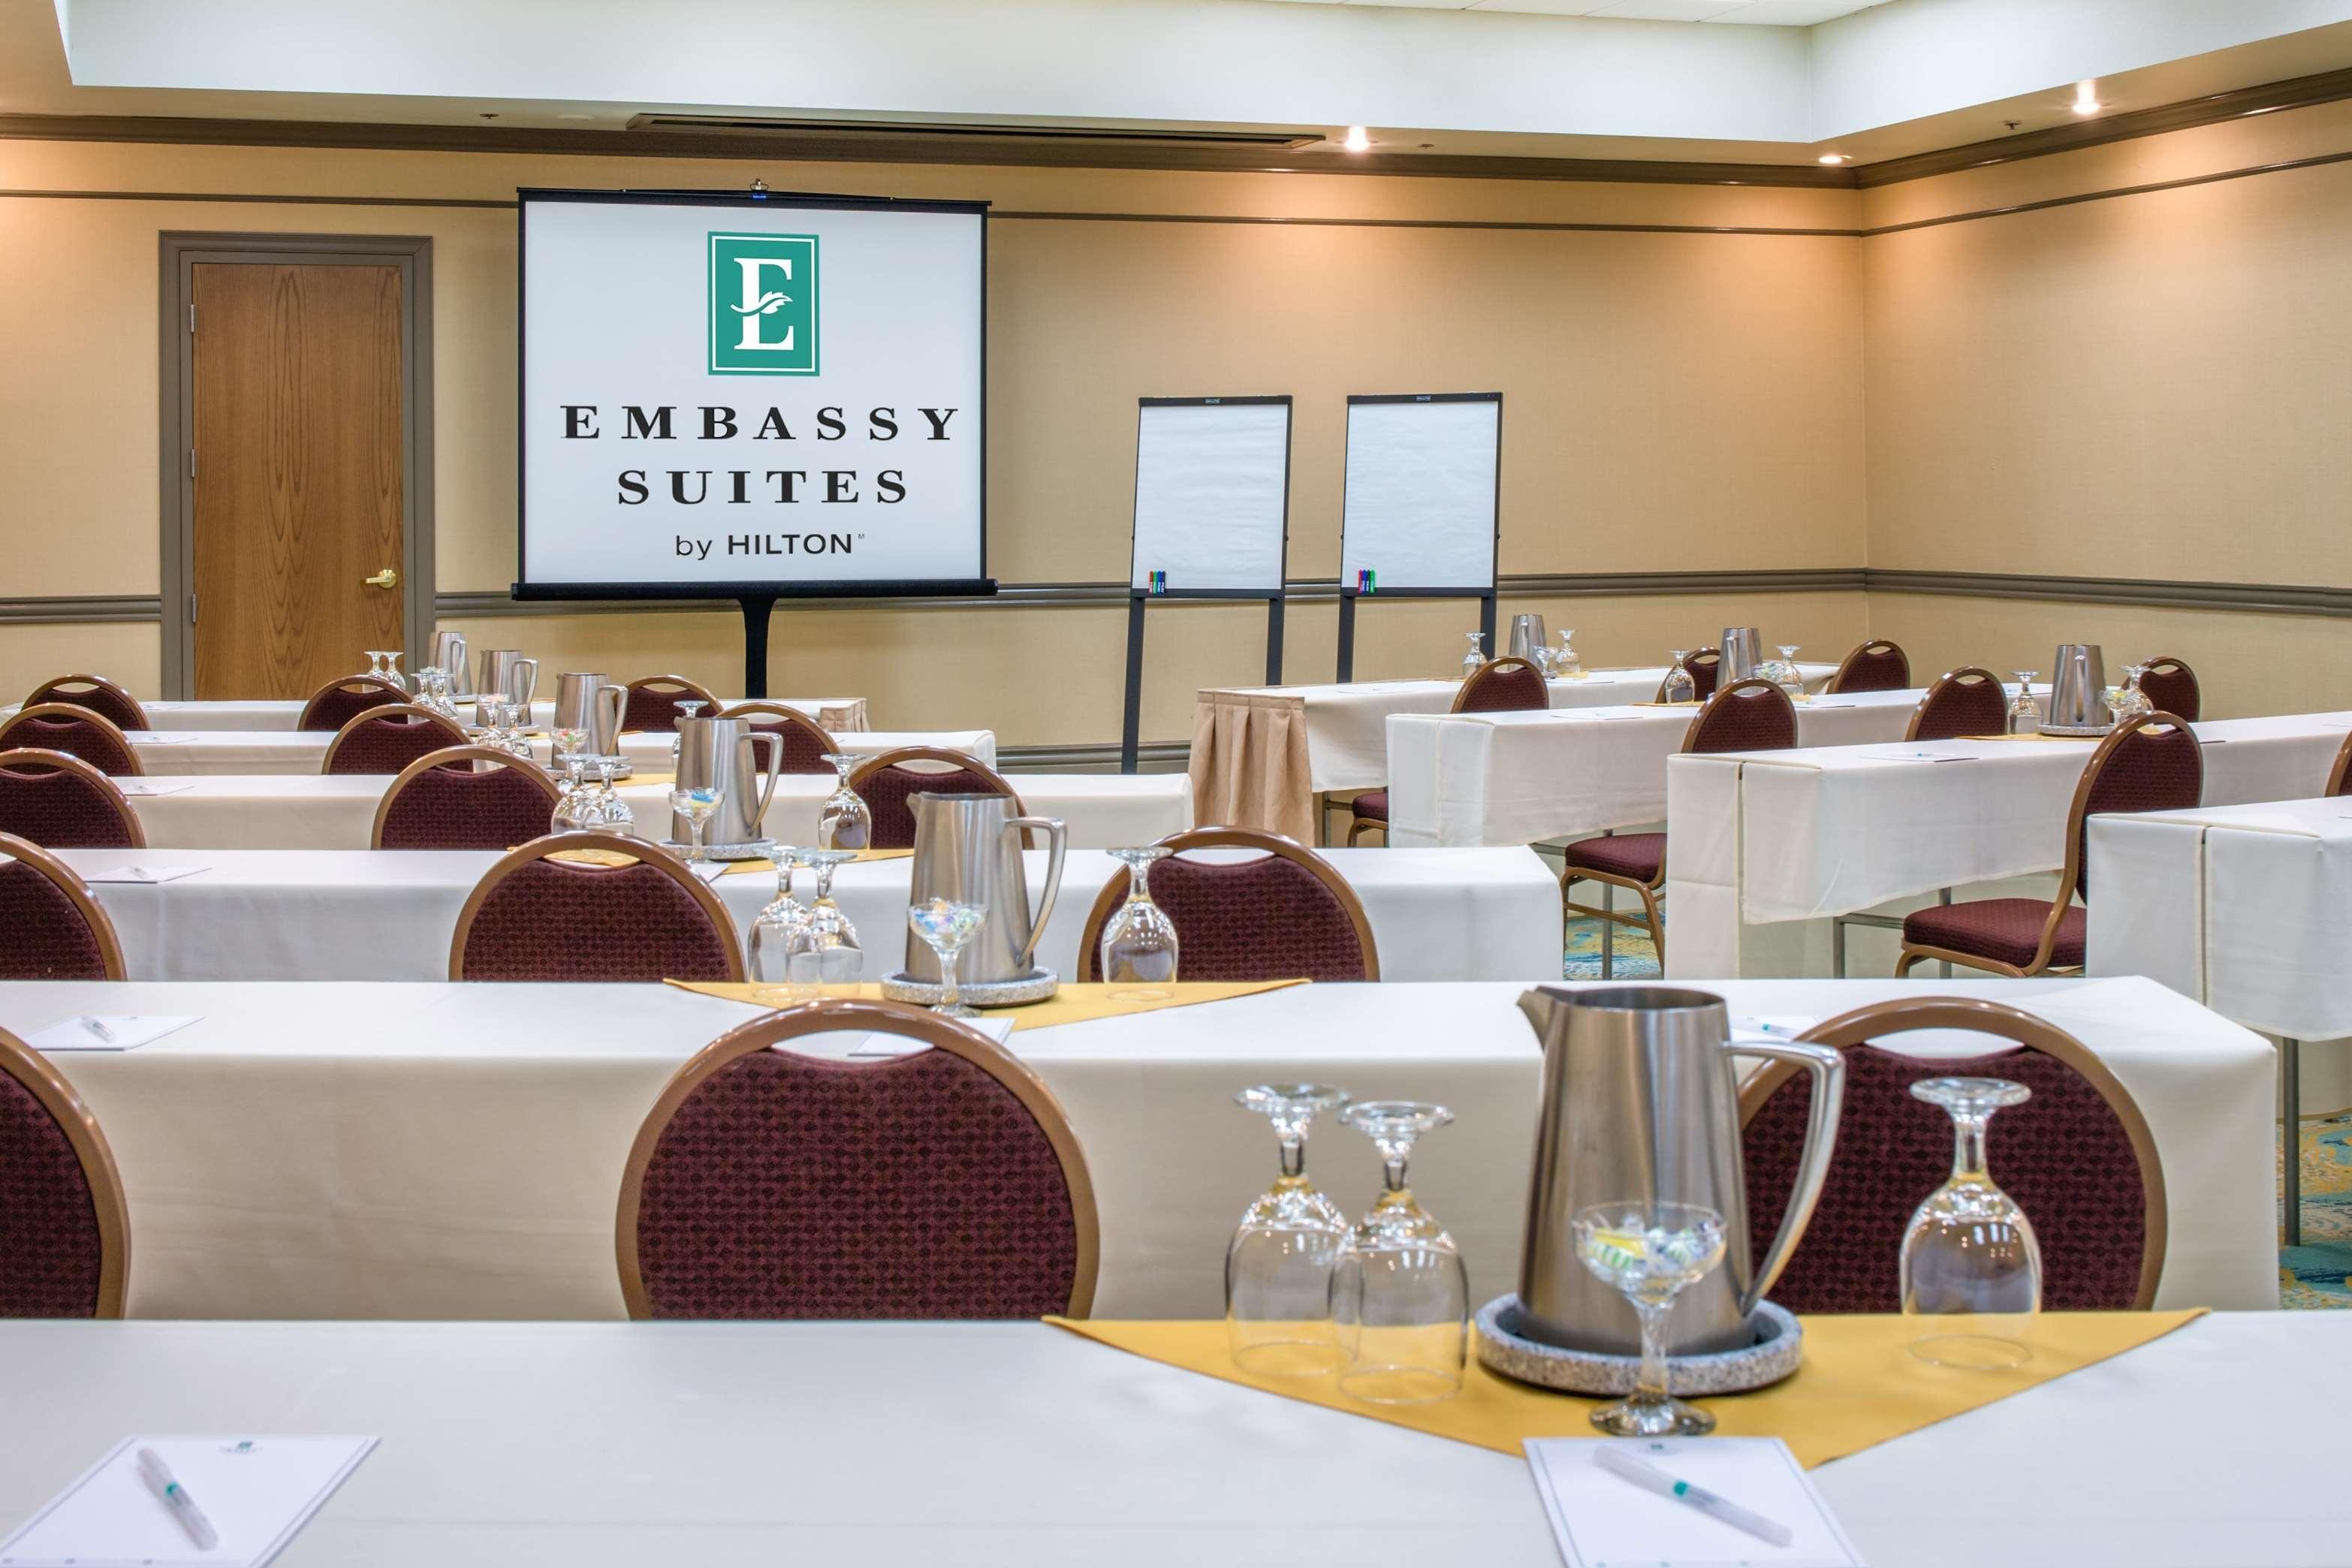 Basil S Kitchen Embassy Suites